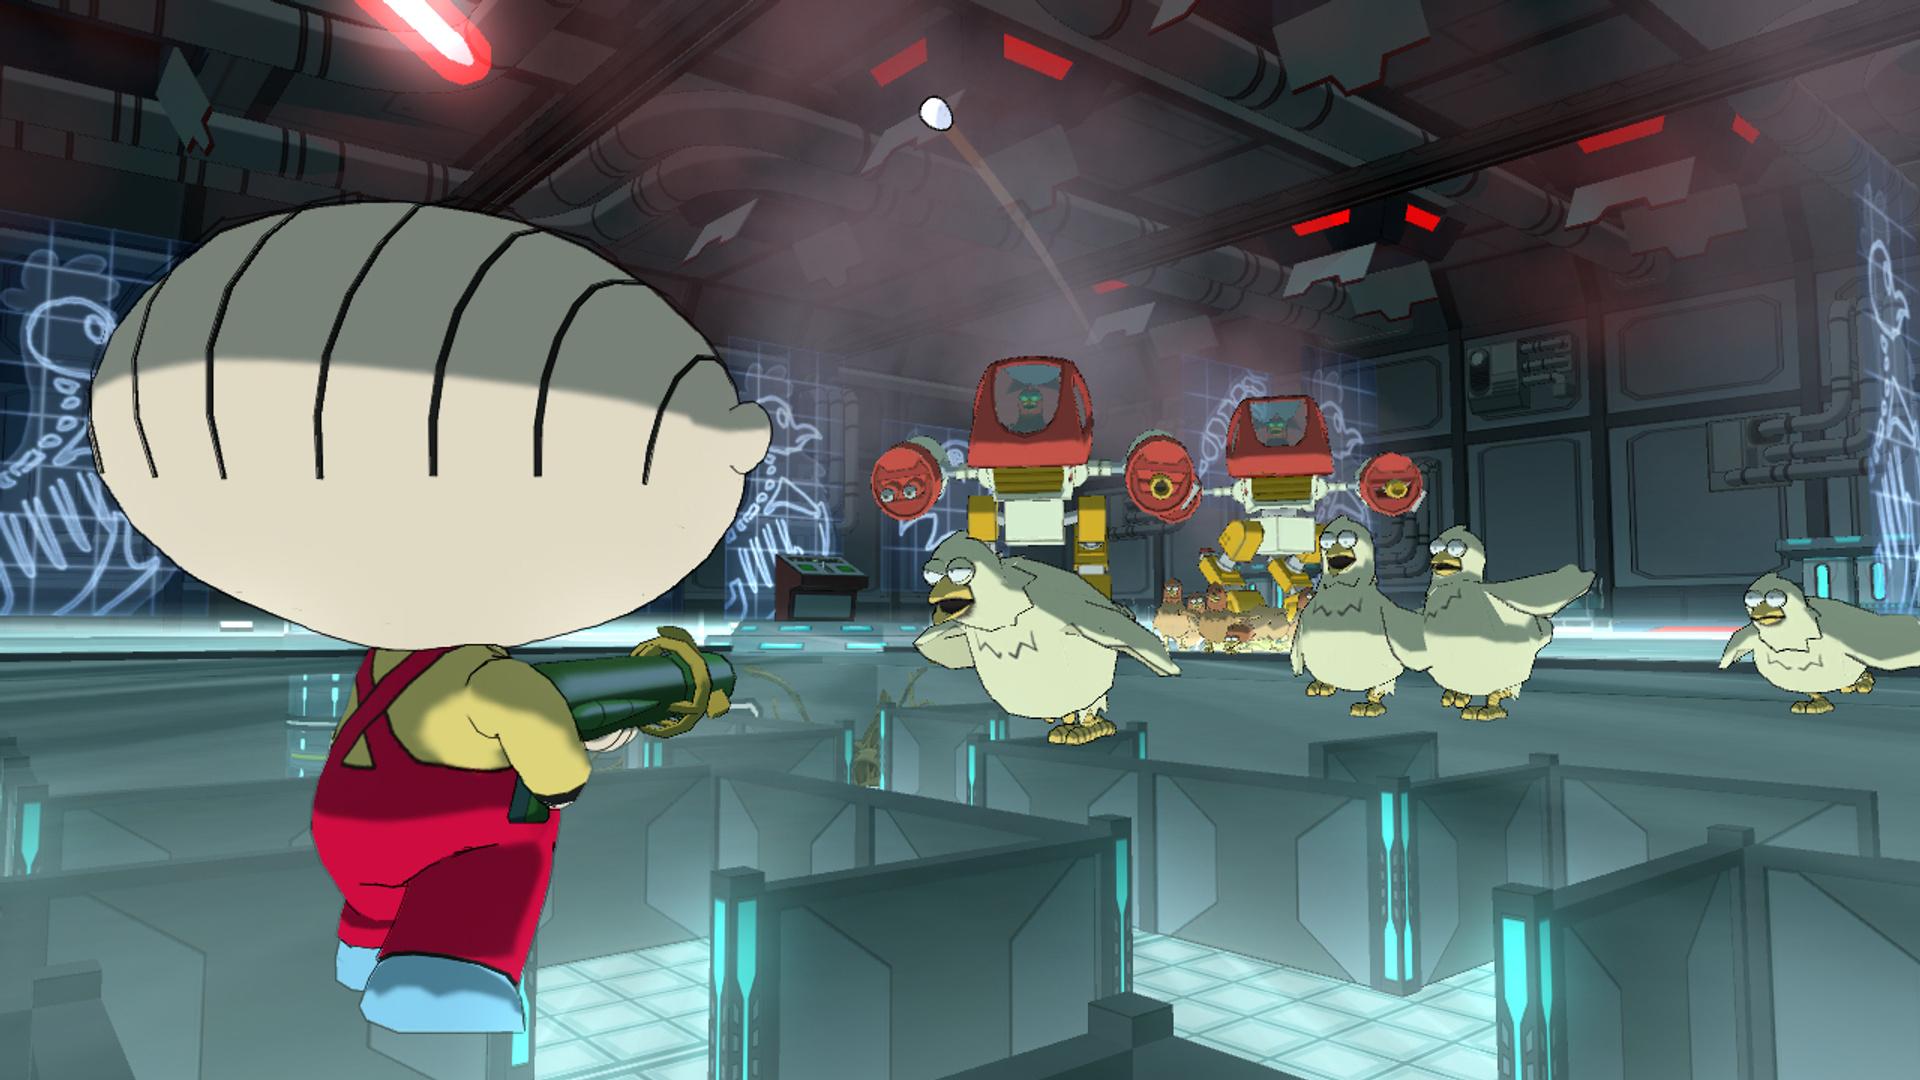 Buy Cheap Family Guy: Back to the Multiverse CD Keys Online • CDKeyPrices.com